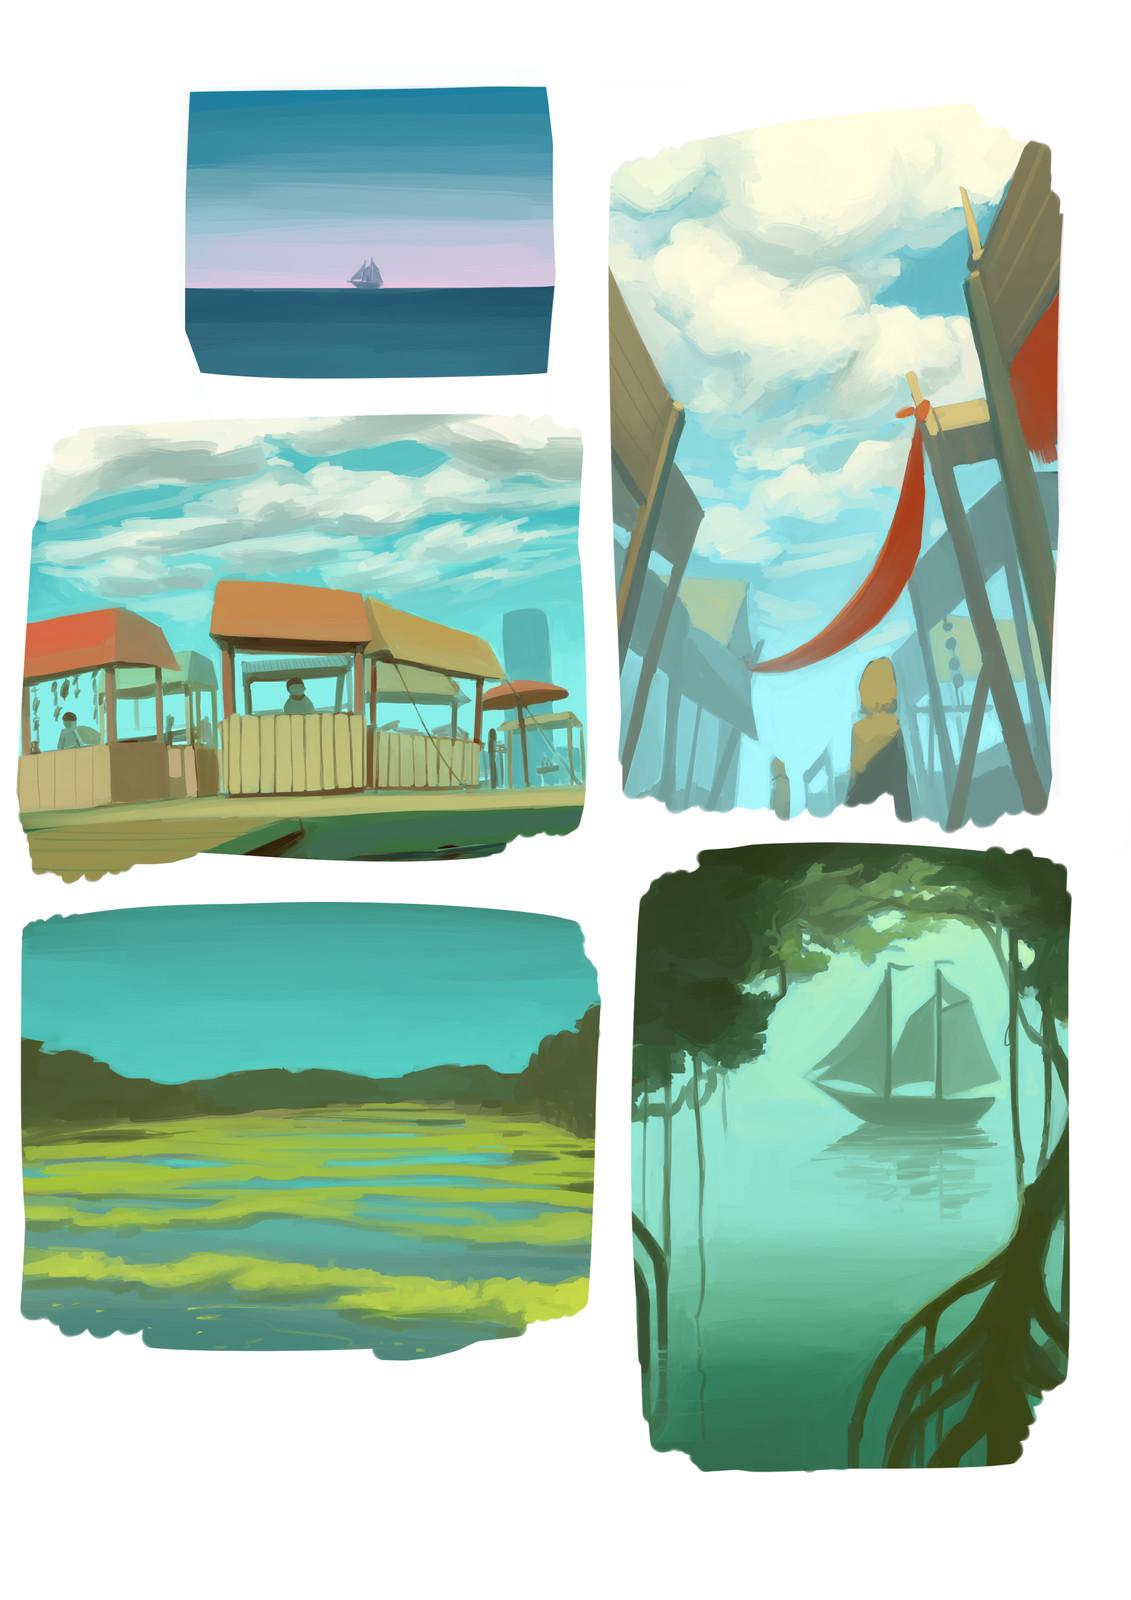 Environment concepts 1